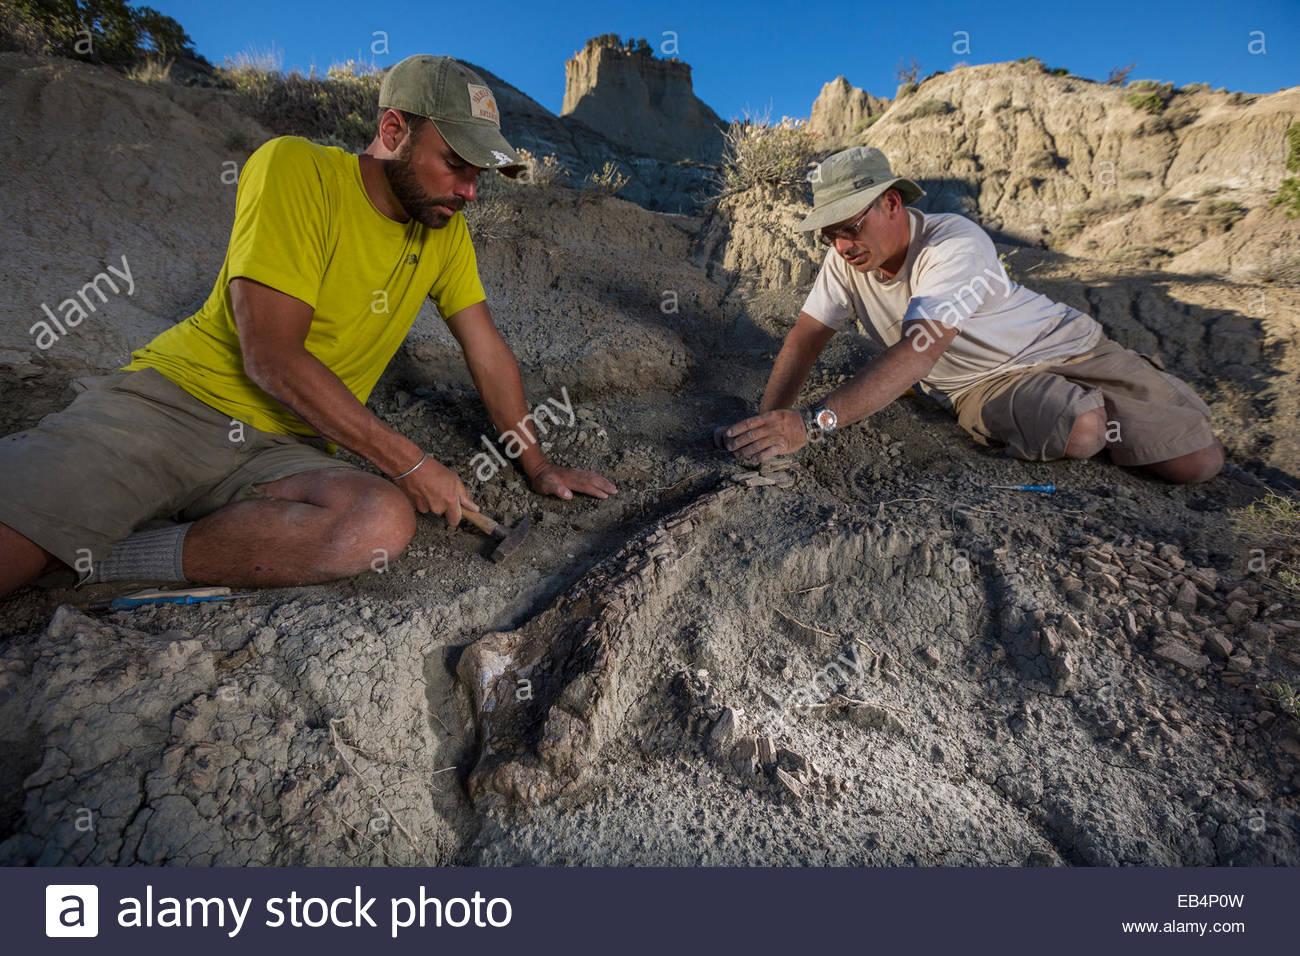 Paleontologists excavate and prepare a large therapod pelvic bone. - Stock Image